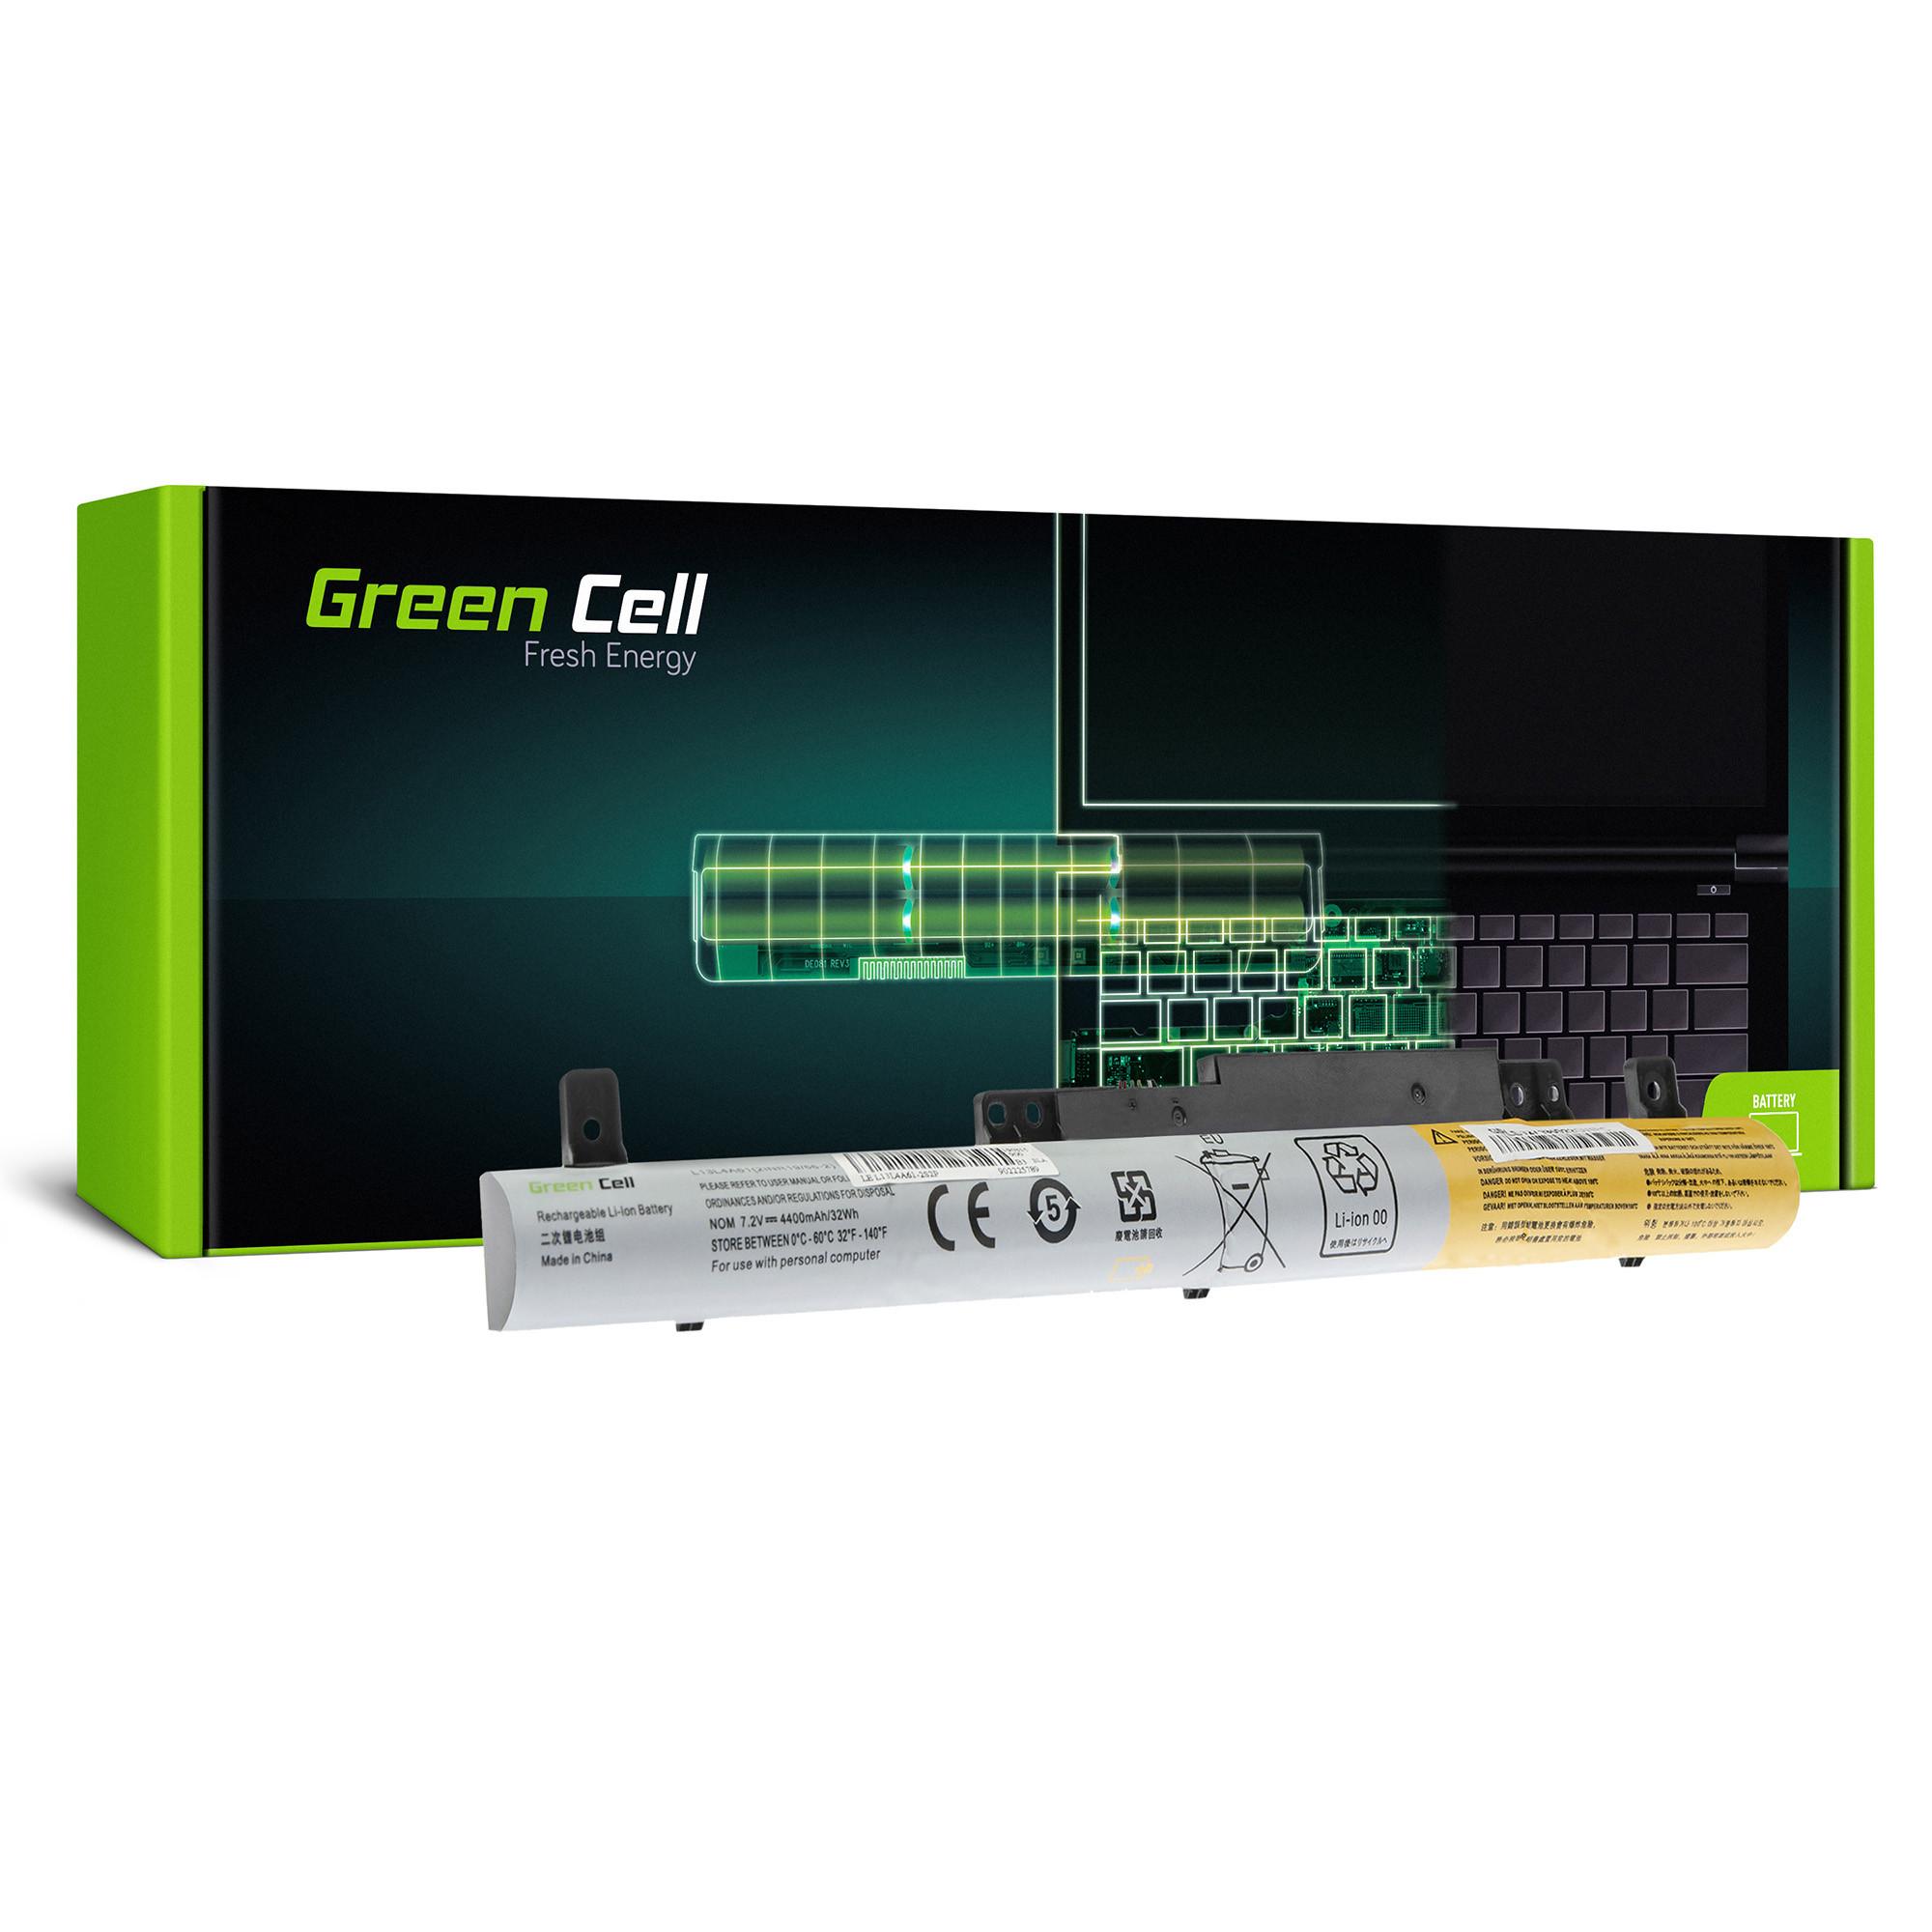 Green Cell LE127 Baterie Lenovo L13L4A61 L13L4E61 L13M4A61 L13S4A61 Lenovo Flex 2: 14 14D 15 15D 4400mAh Li-ion - neoriginální